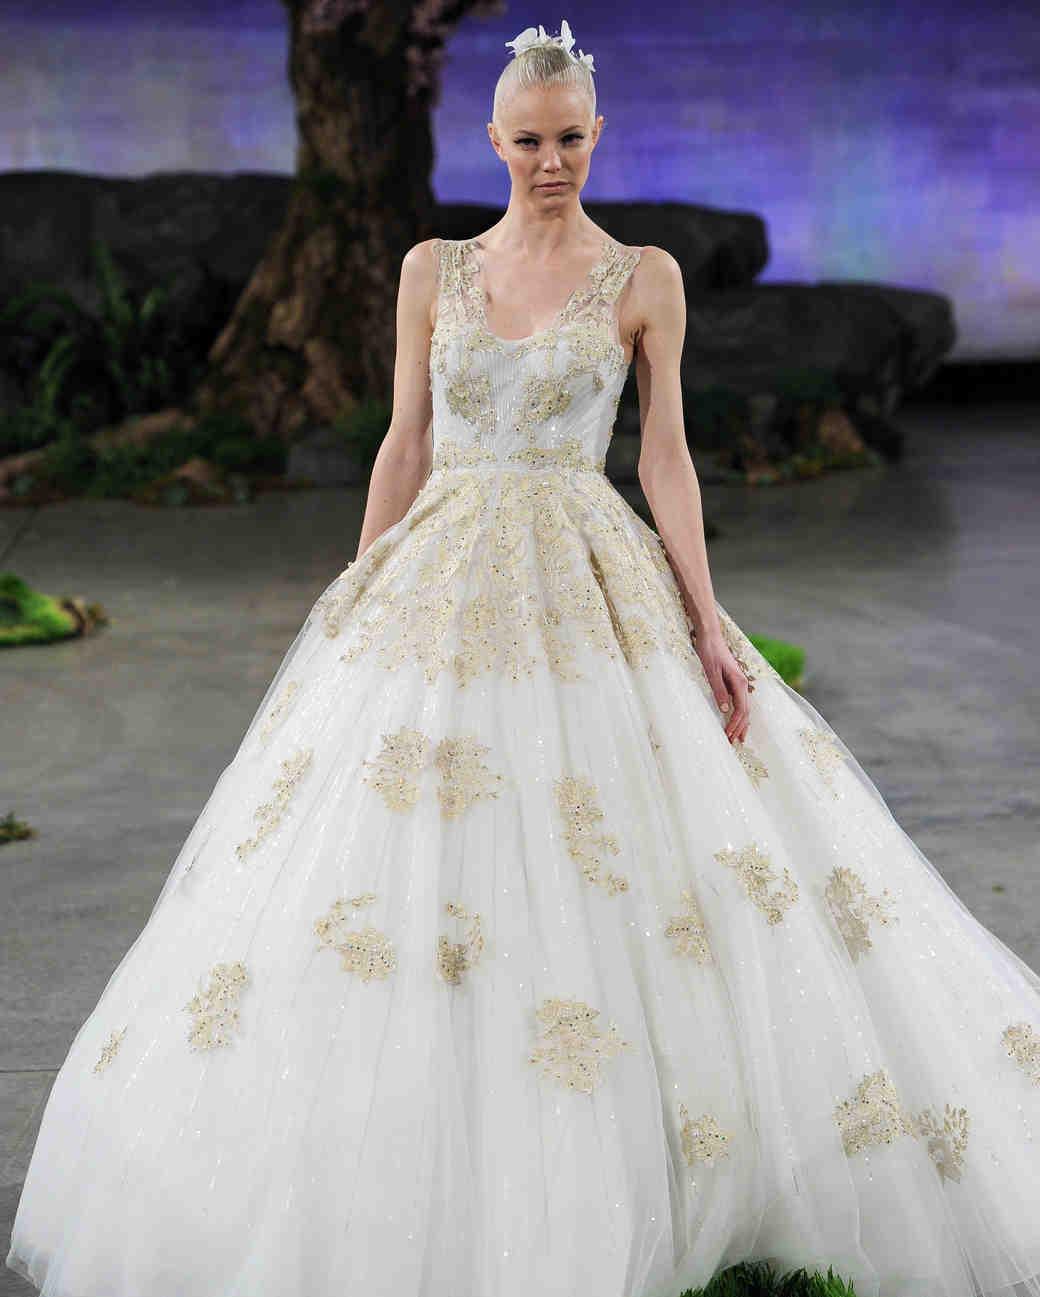 50-states-wedding-dresses-nebraska-ines-di-santo-0615.jpg